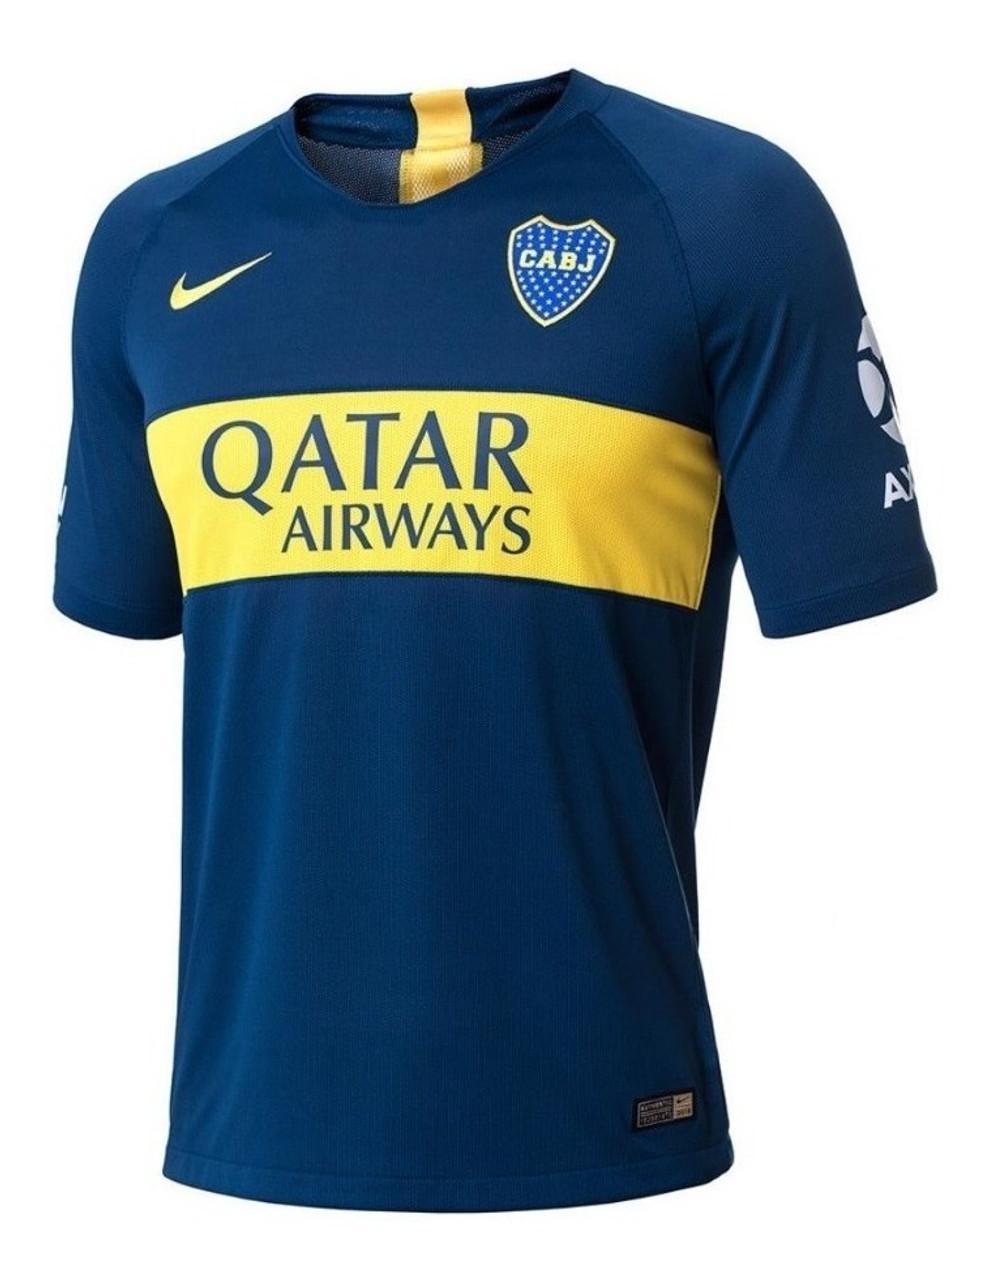 separation shoes 382c9 4ee46 Boca Juniors Official Soccer Men's Camiseta Jersey, 2019